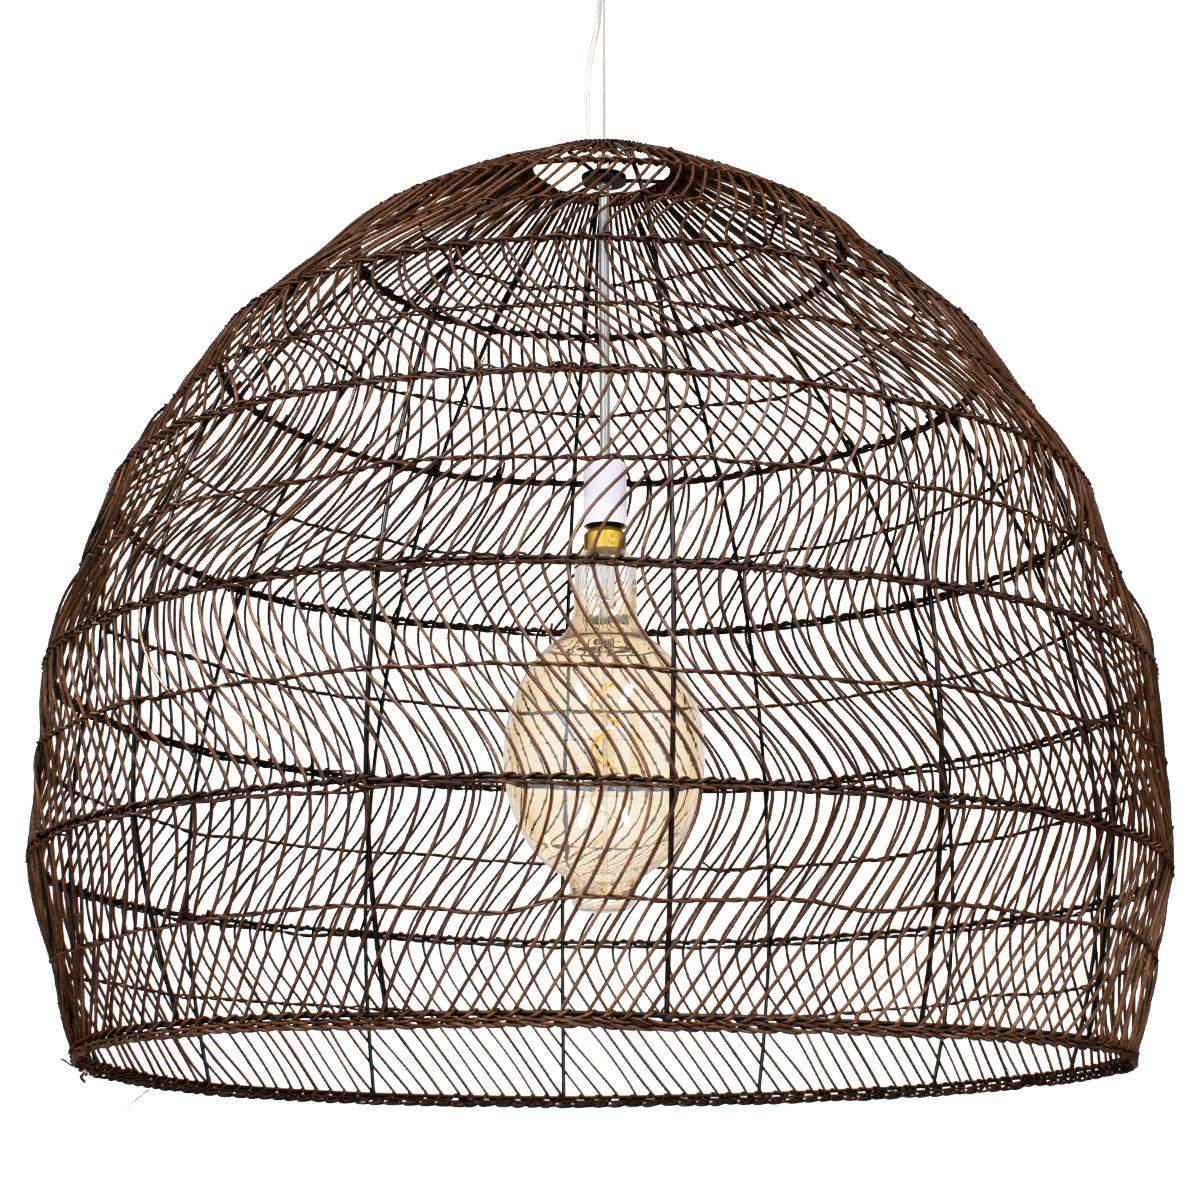 globostar-malibu-00967-vintage-kremasto-fotistiko-orofis-monofoto-kafe-xilino-bamboo-f100-x-y86cm